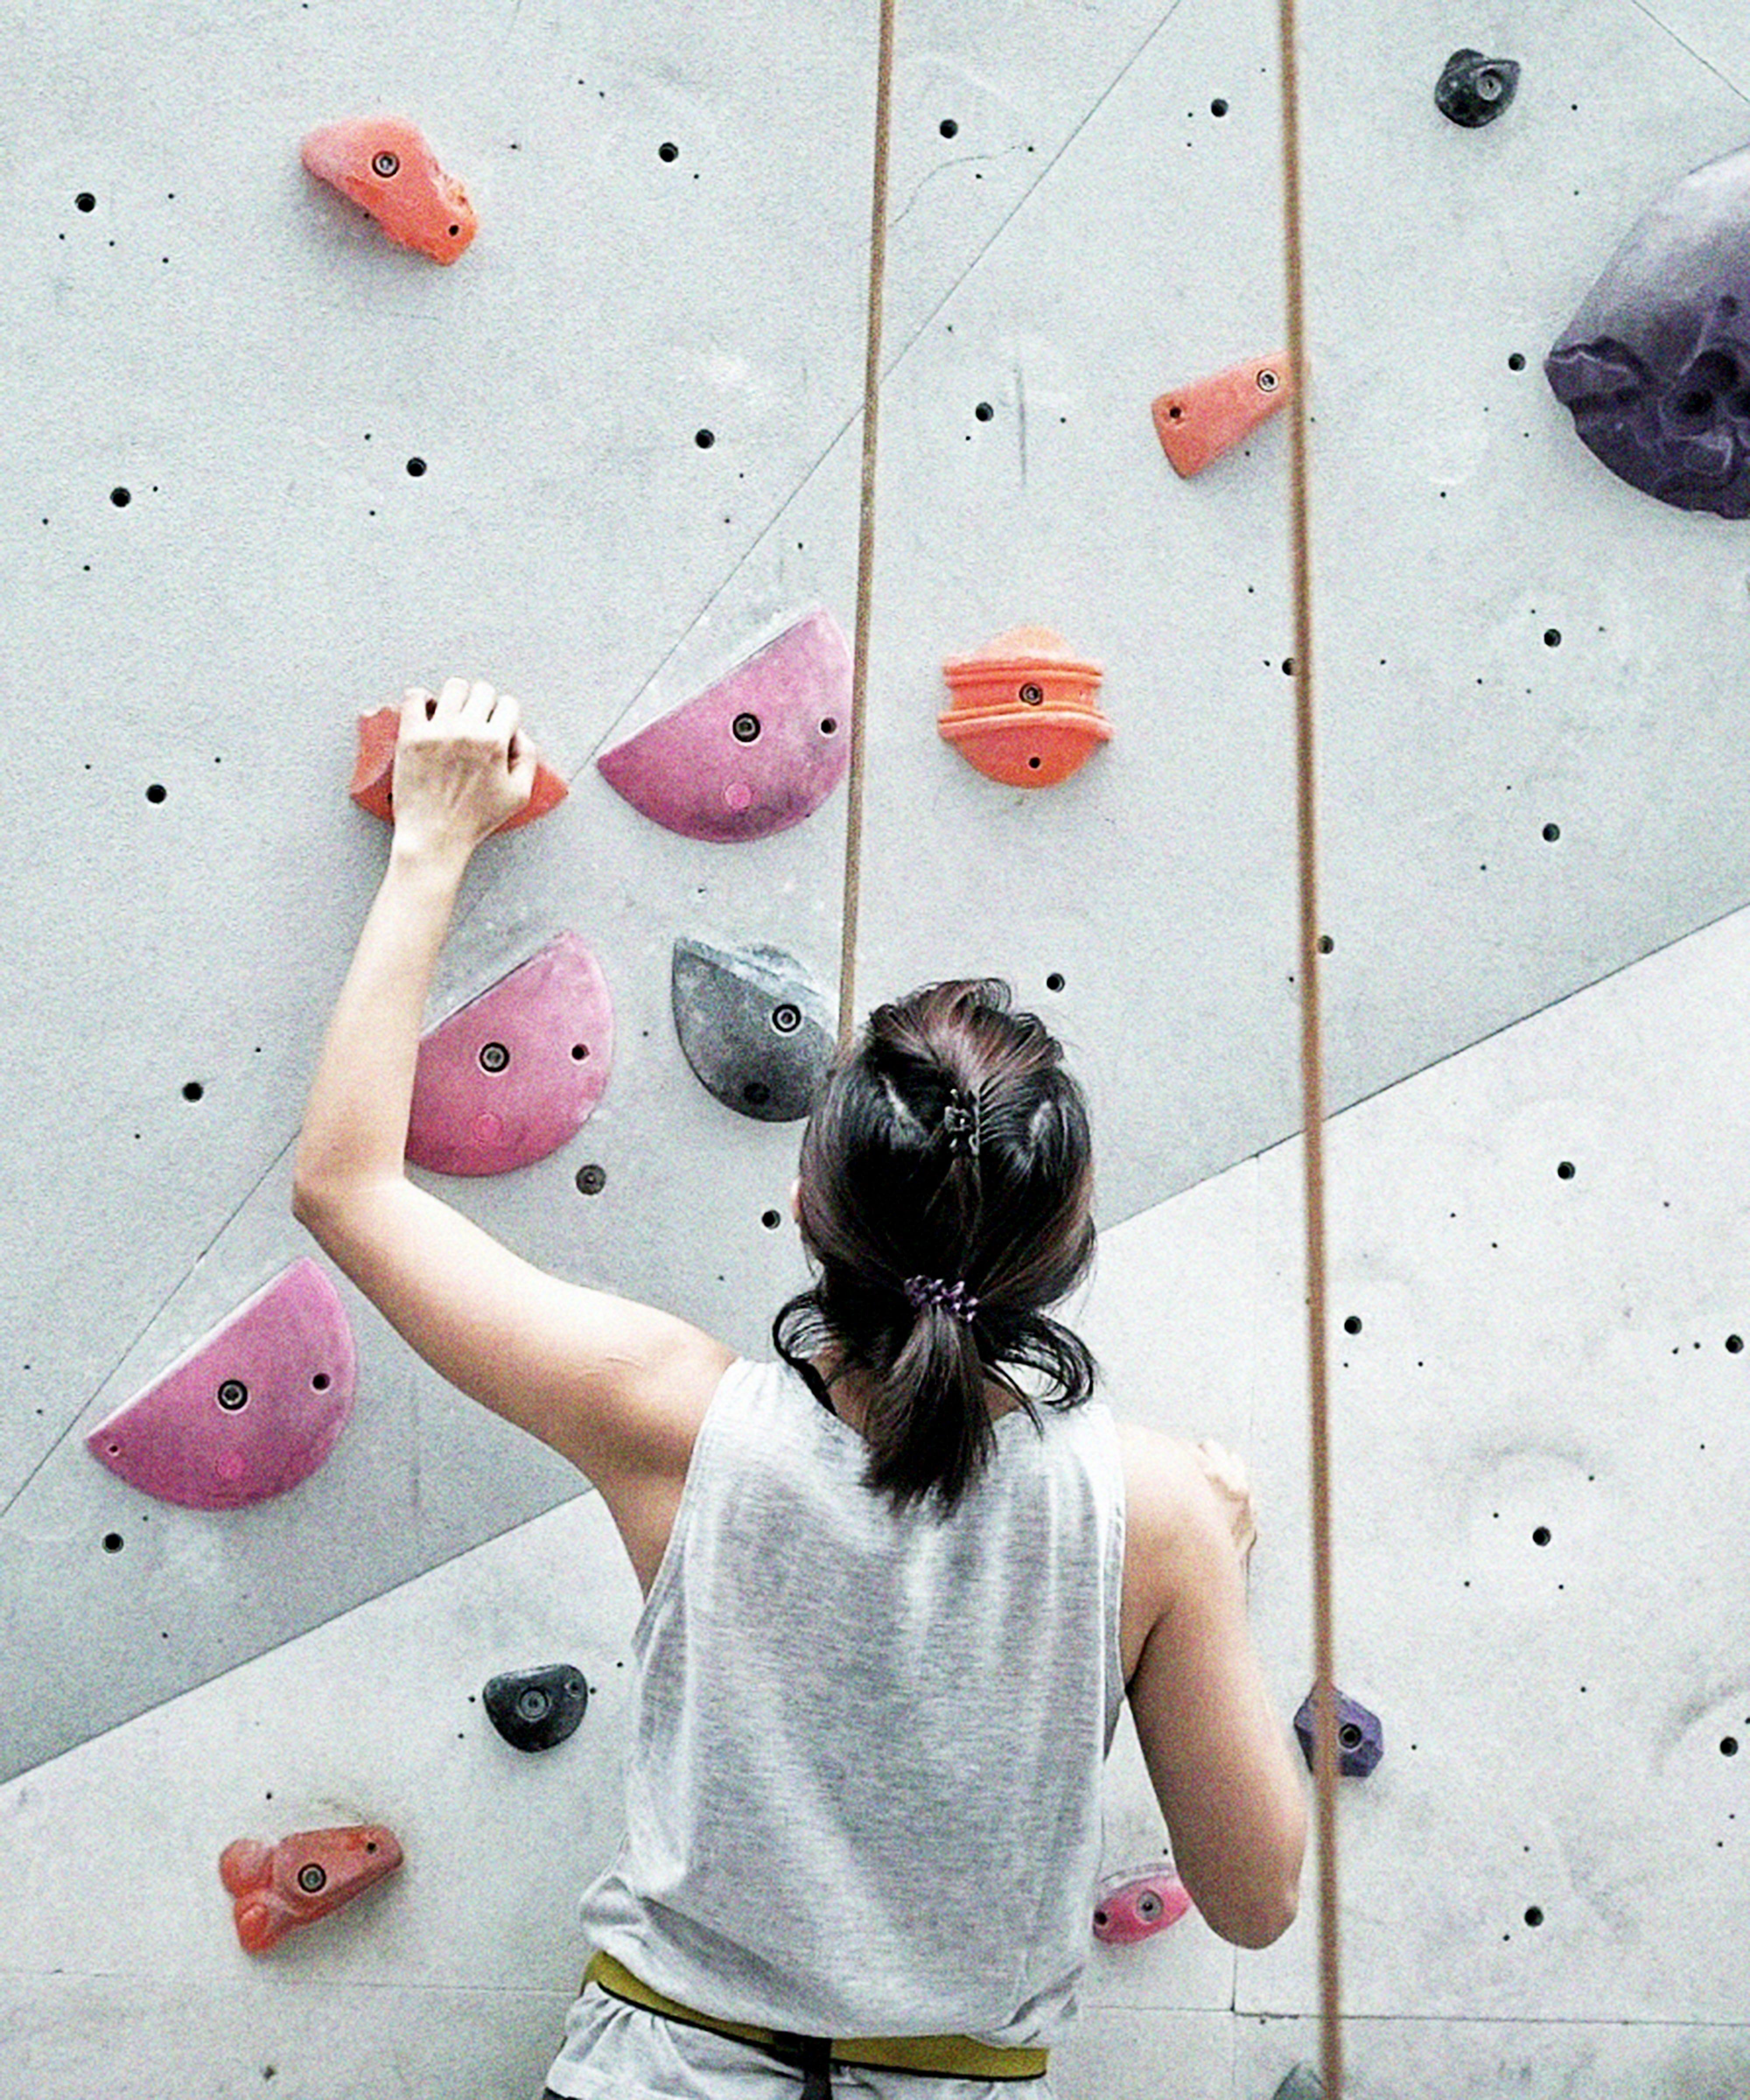 best rock climbing in nyc indoor gyms outdoor parks